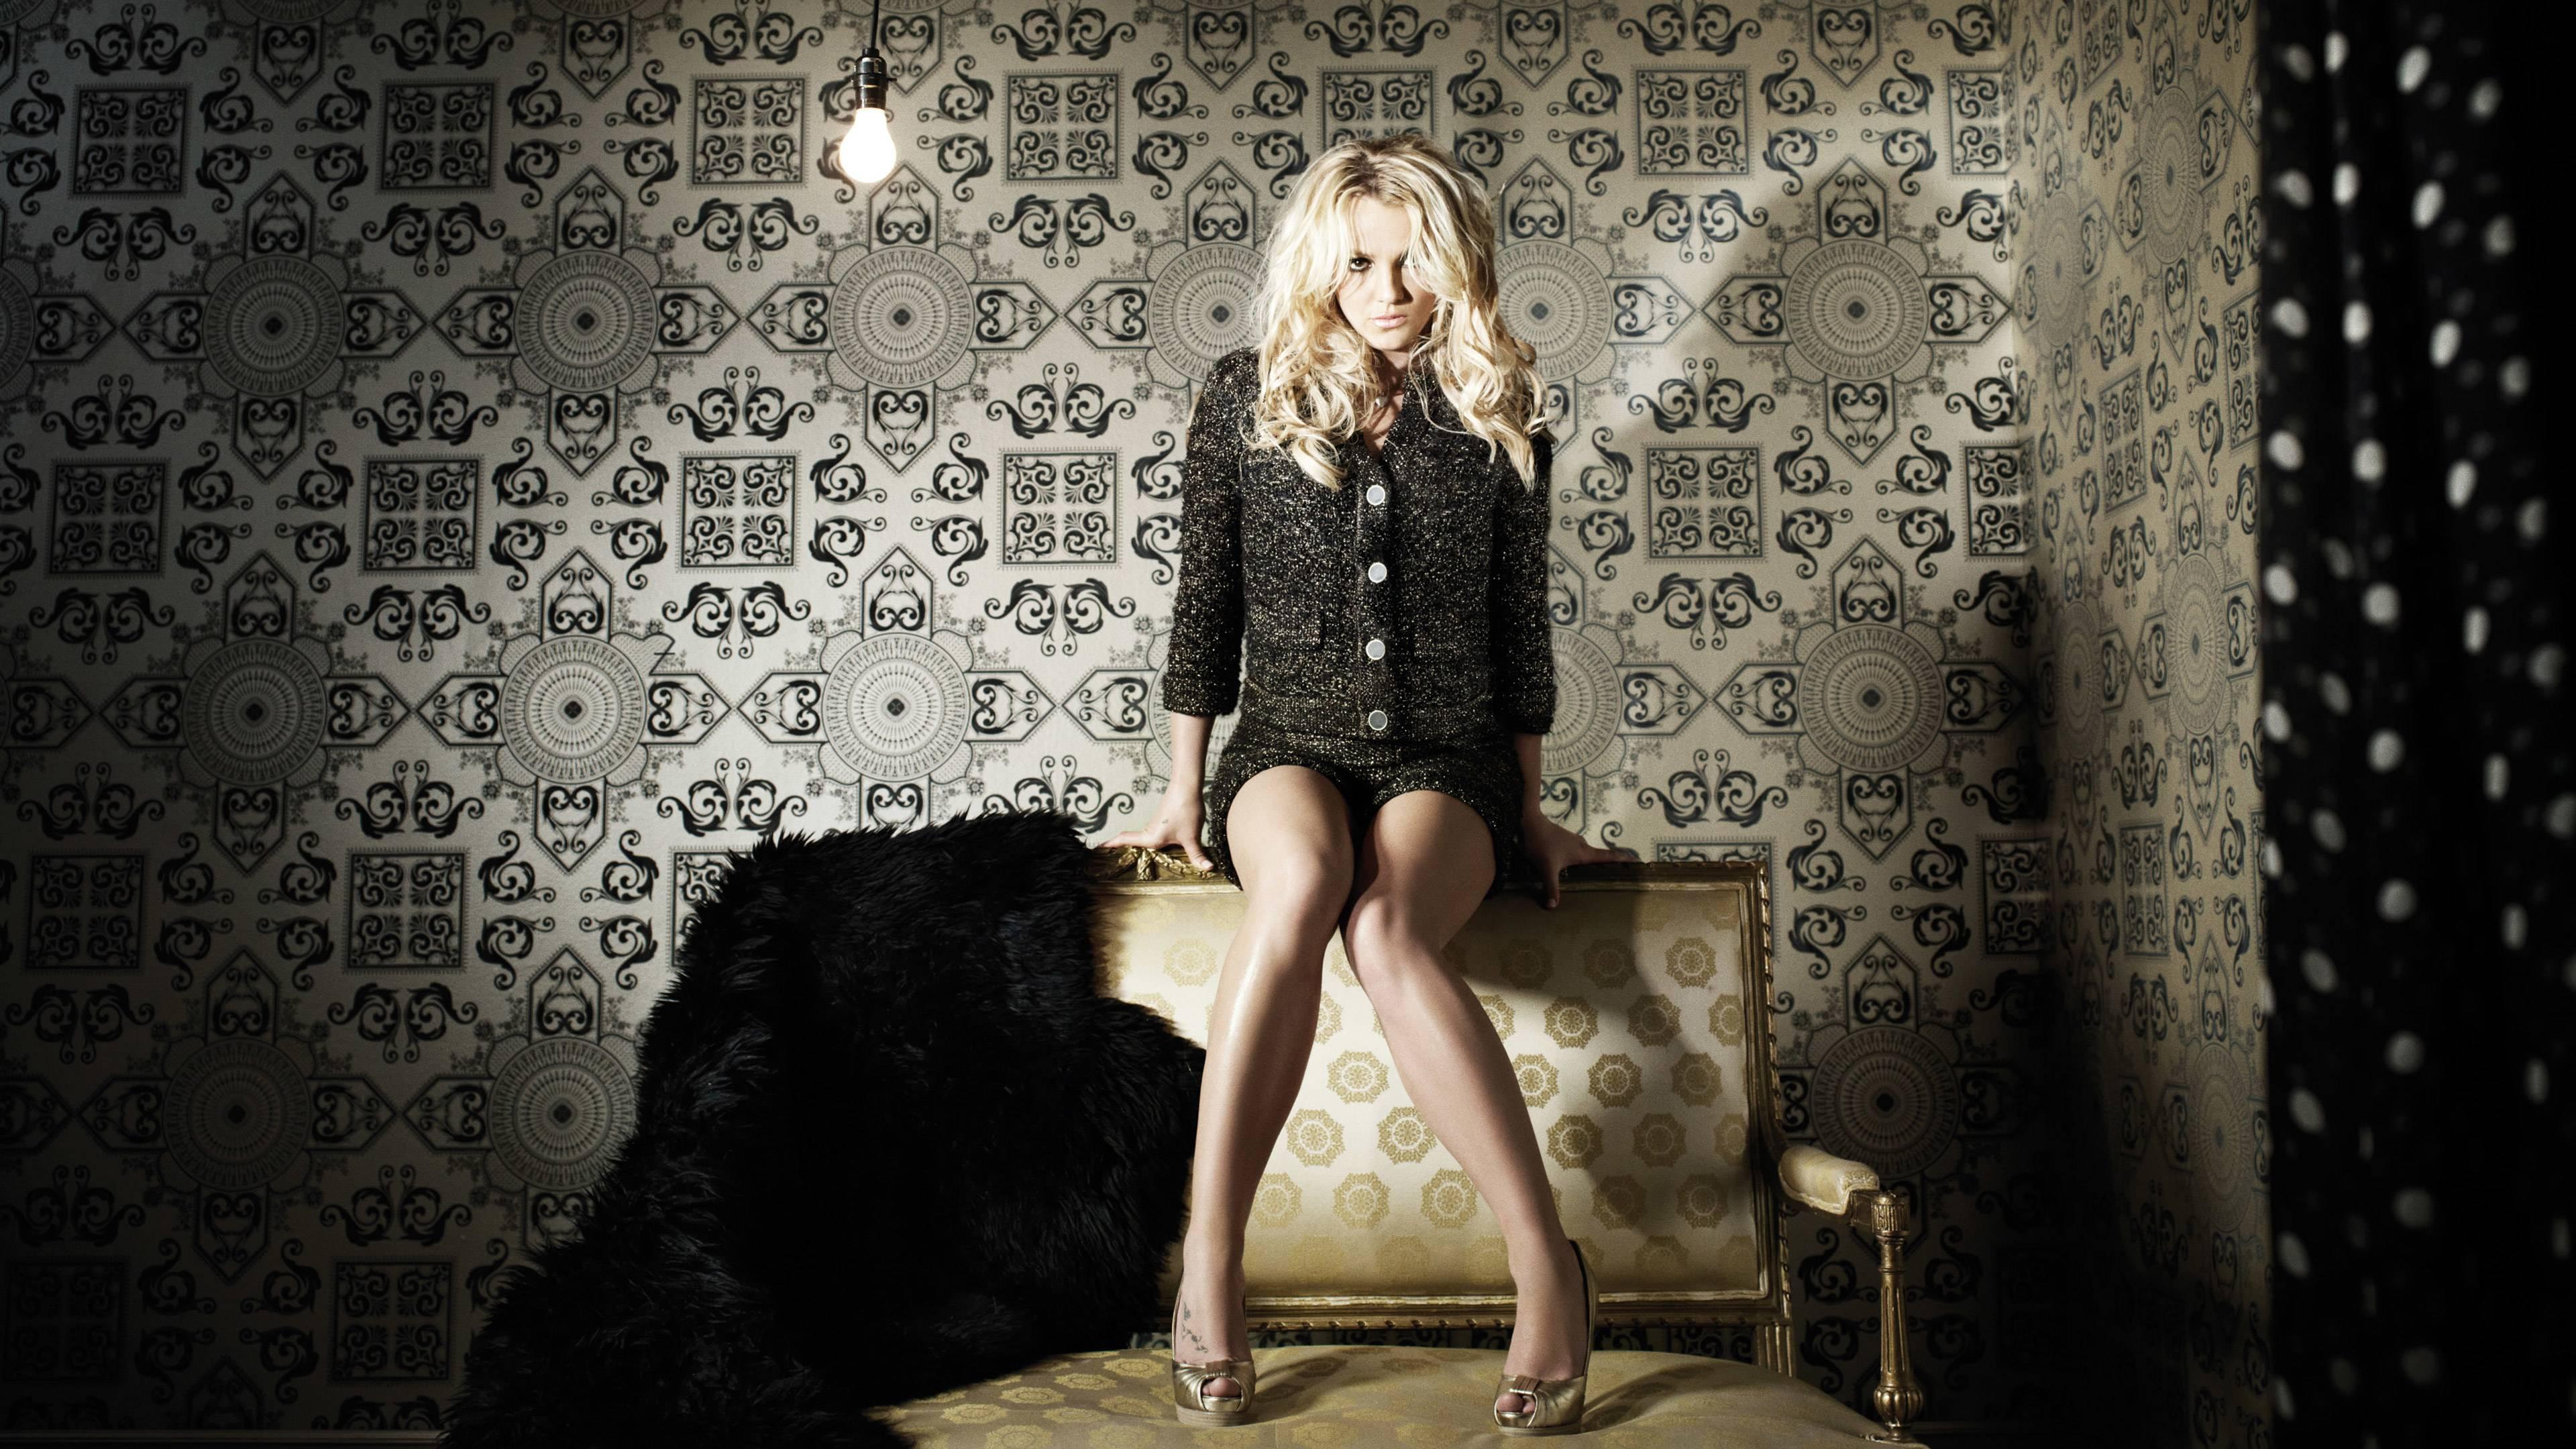 View Britney Spears Wallpaper Desktop Pictures